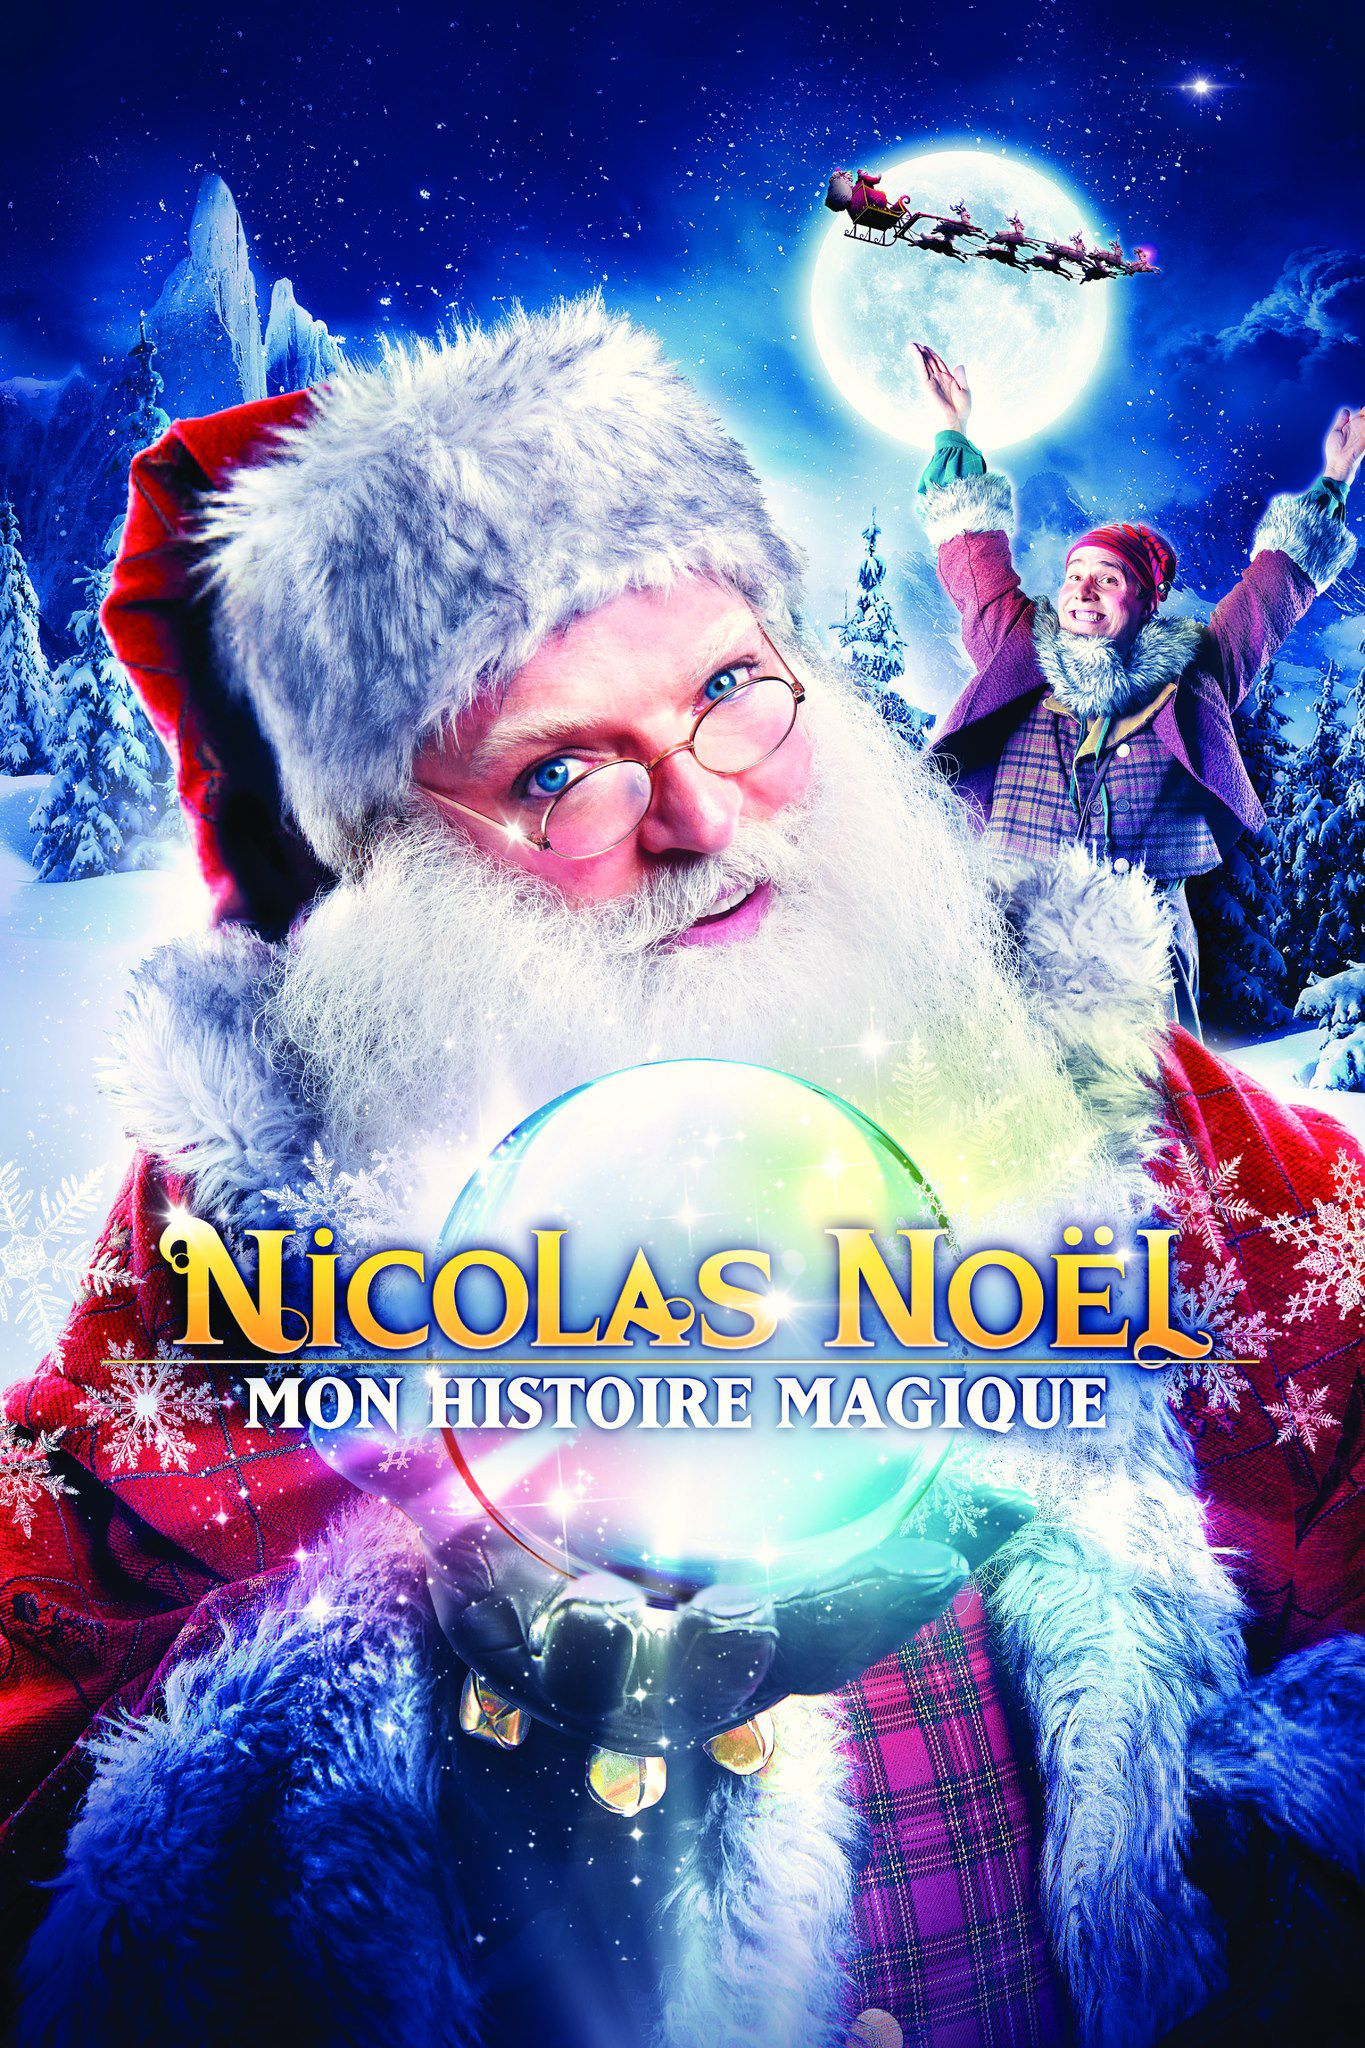 Nicolas Noël, Mon histoire magique - Film (2012)